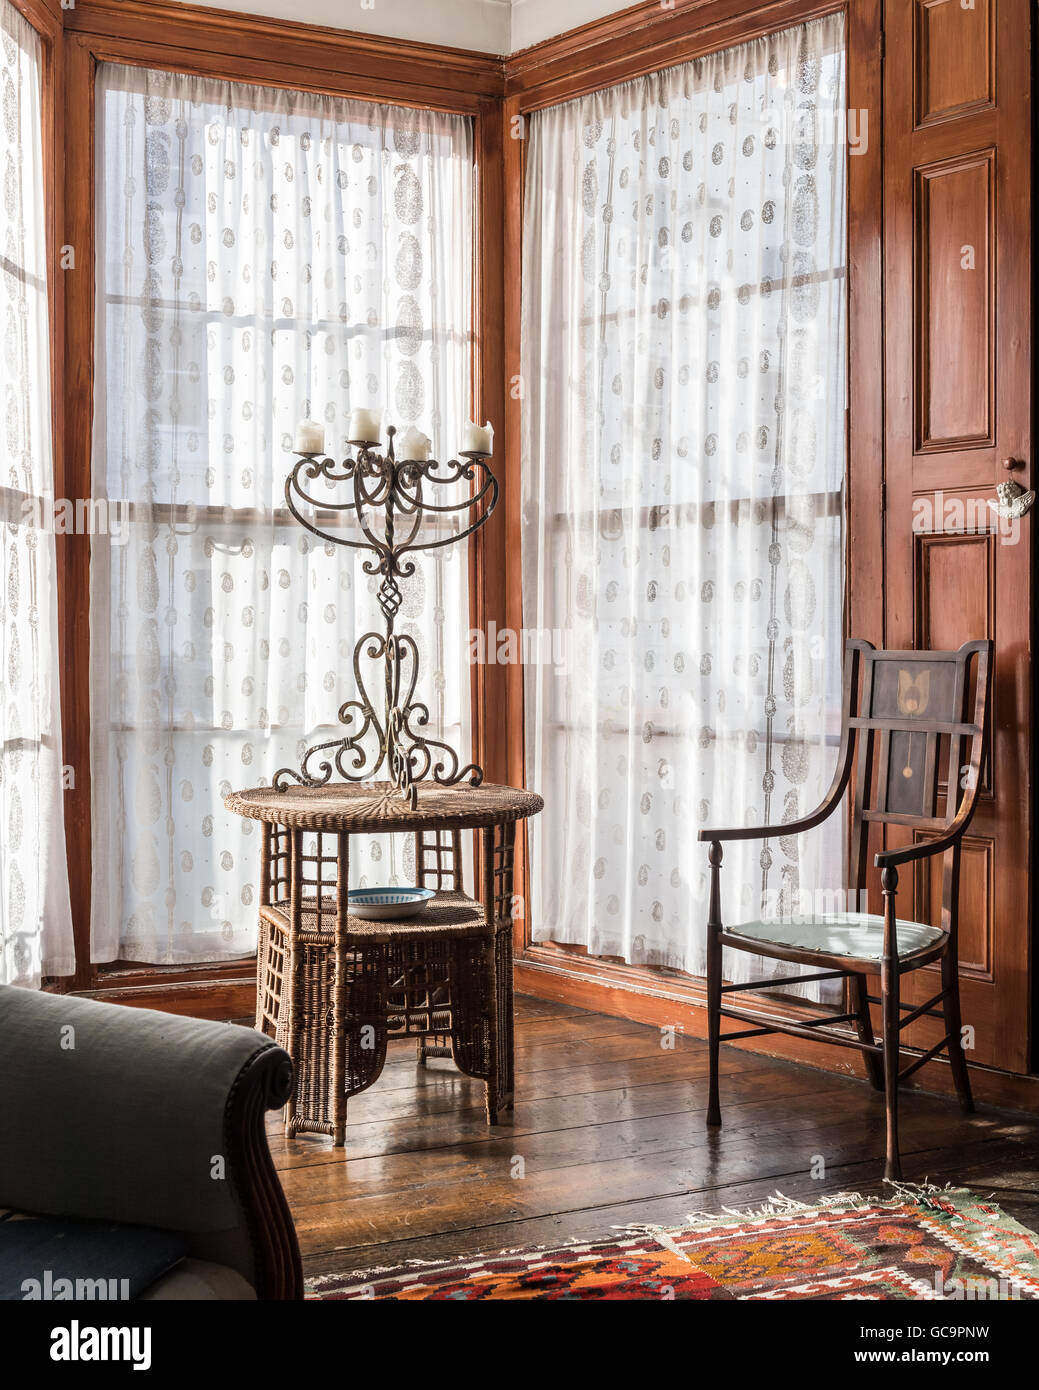 Metal candlestick on wicker side table in window of Nottinghill Victorian terrace, London, UK - Stock Image